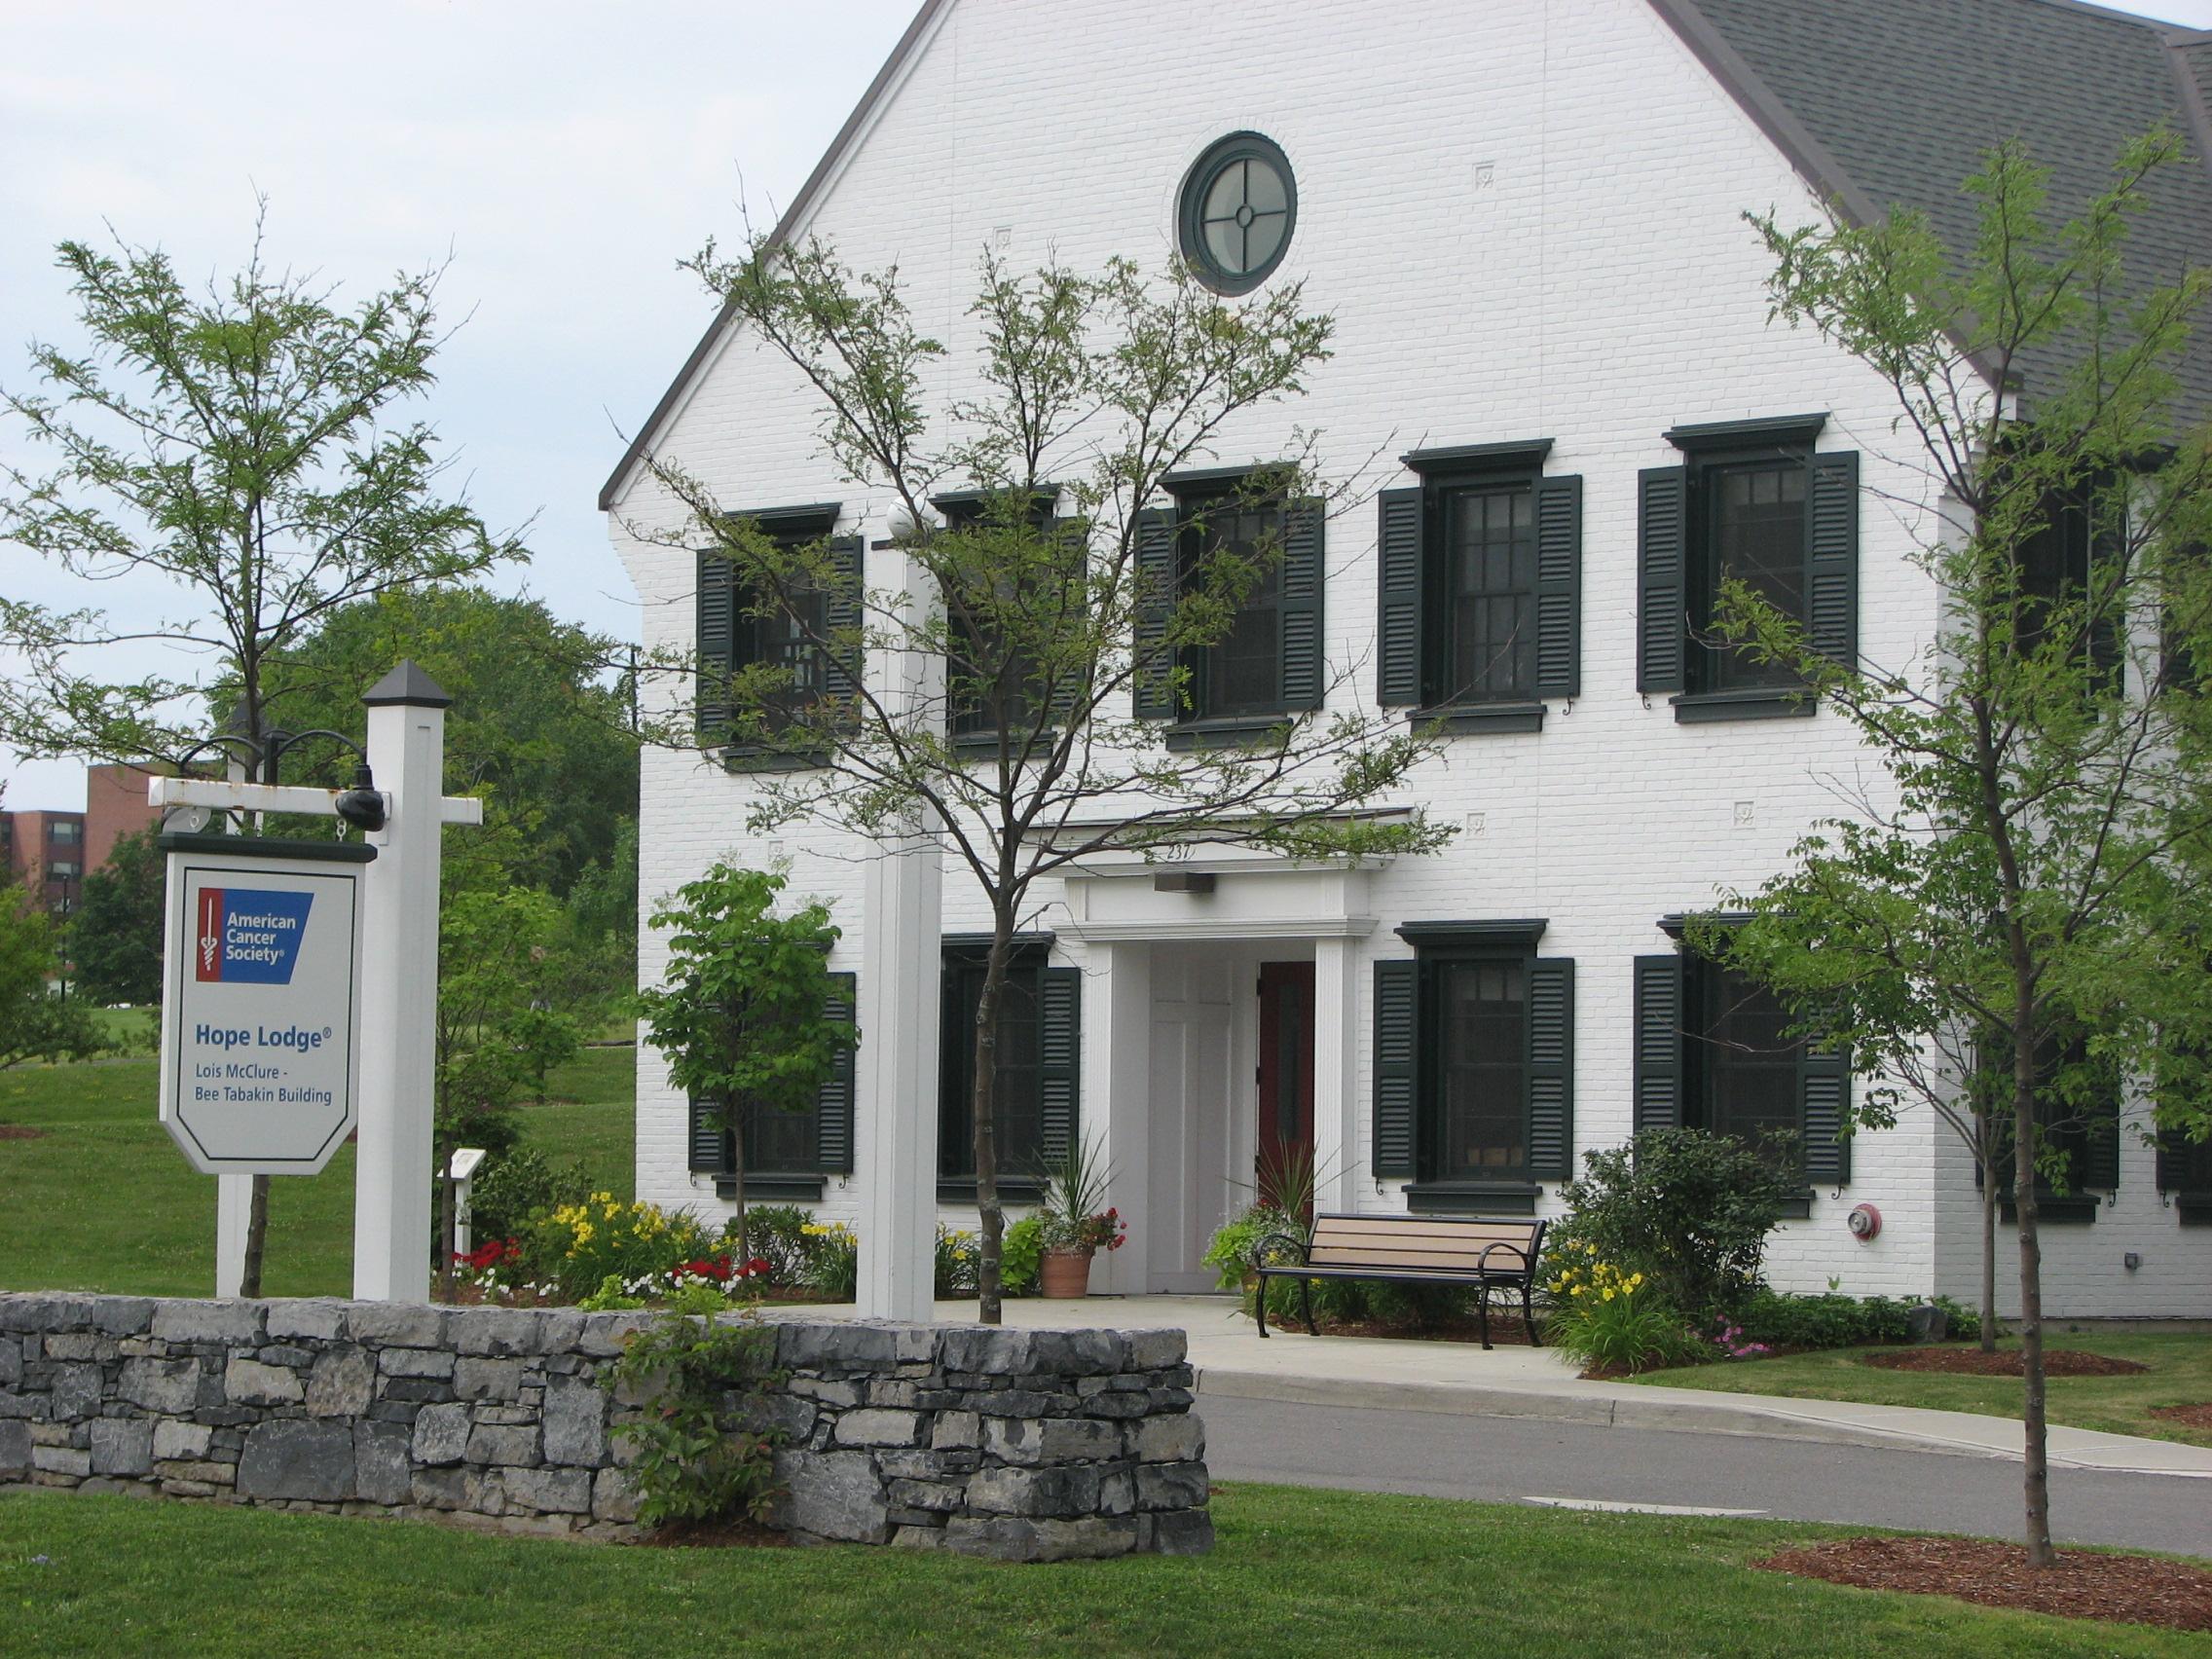 ACS Hope Lodge Lois McClure-Bee Tabakin Building